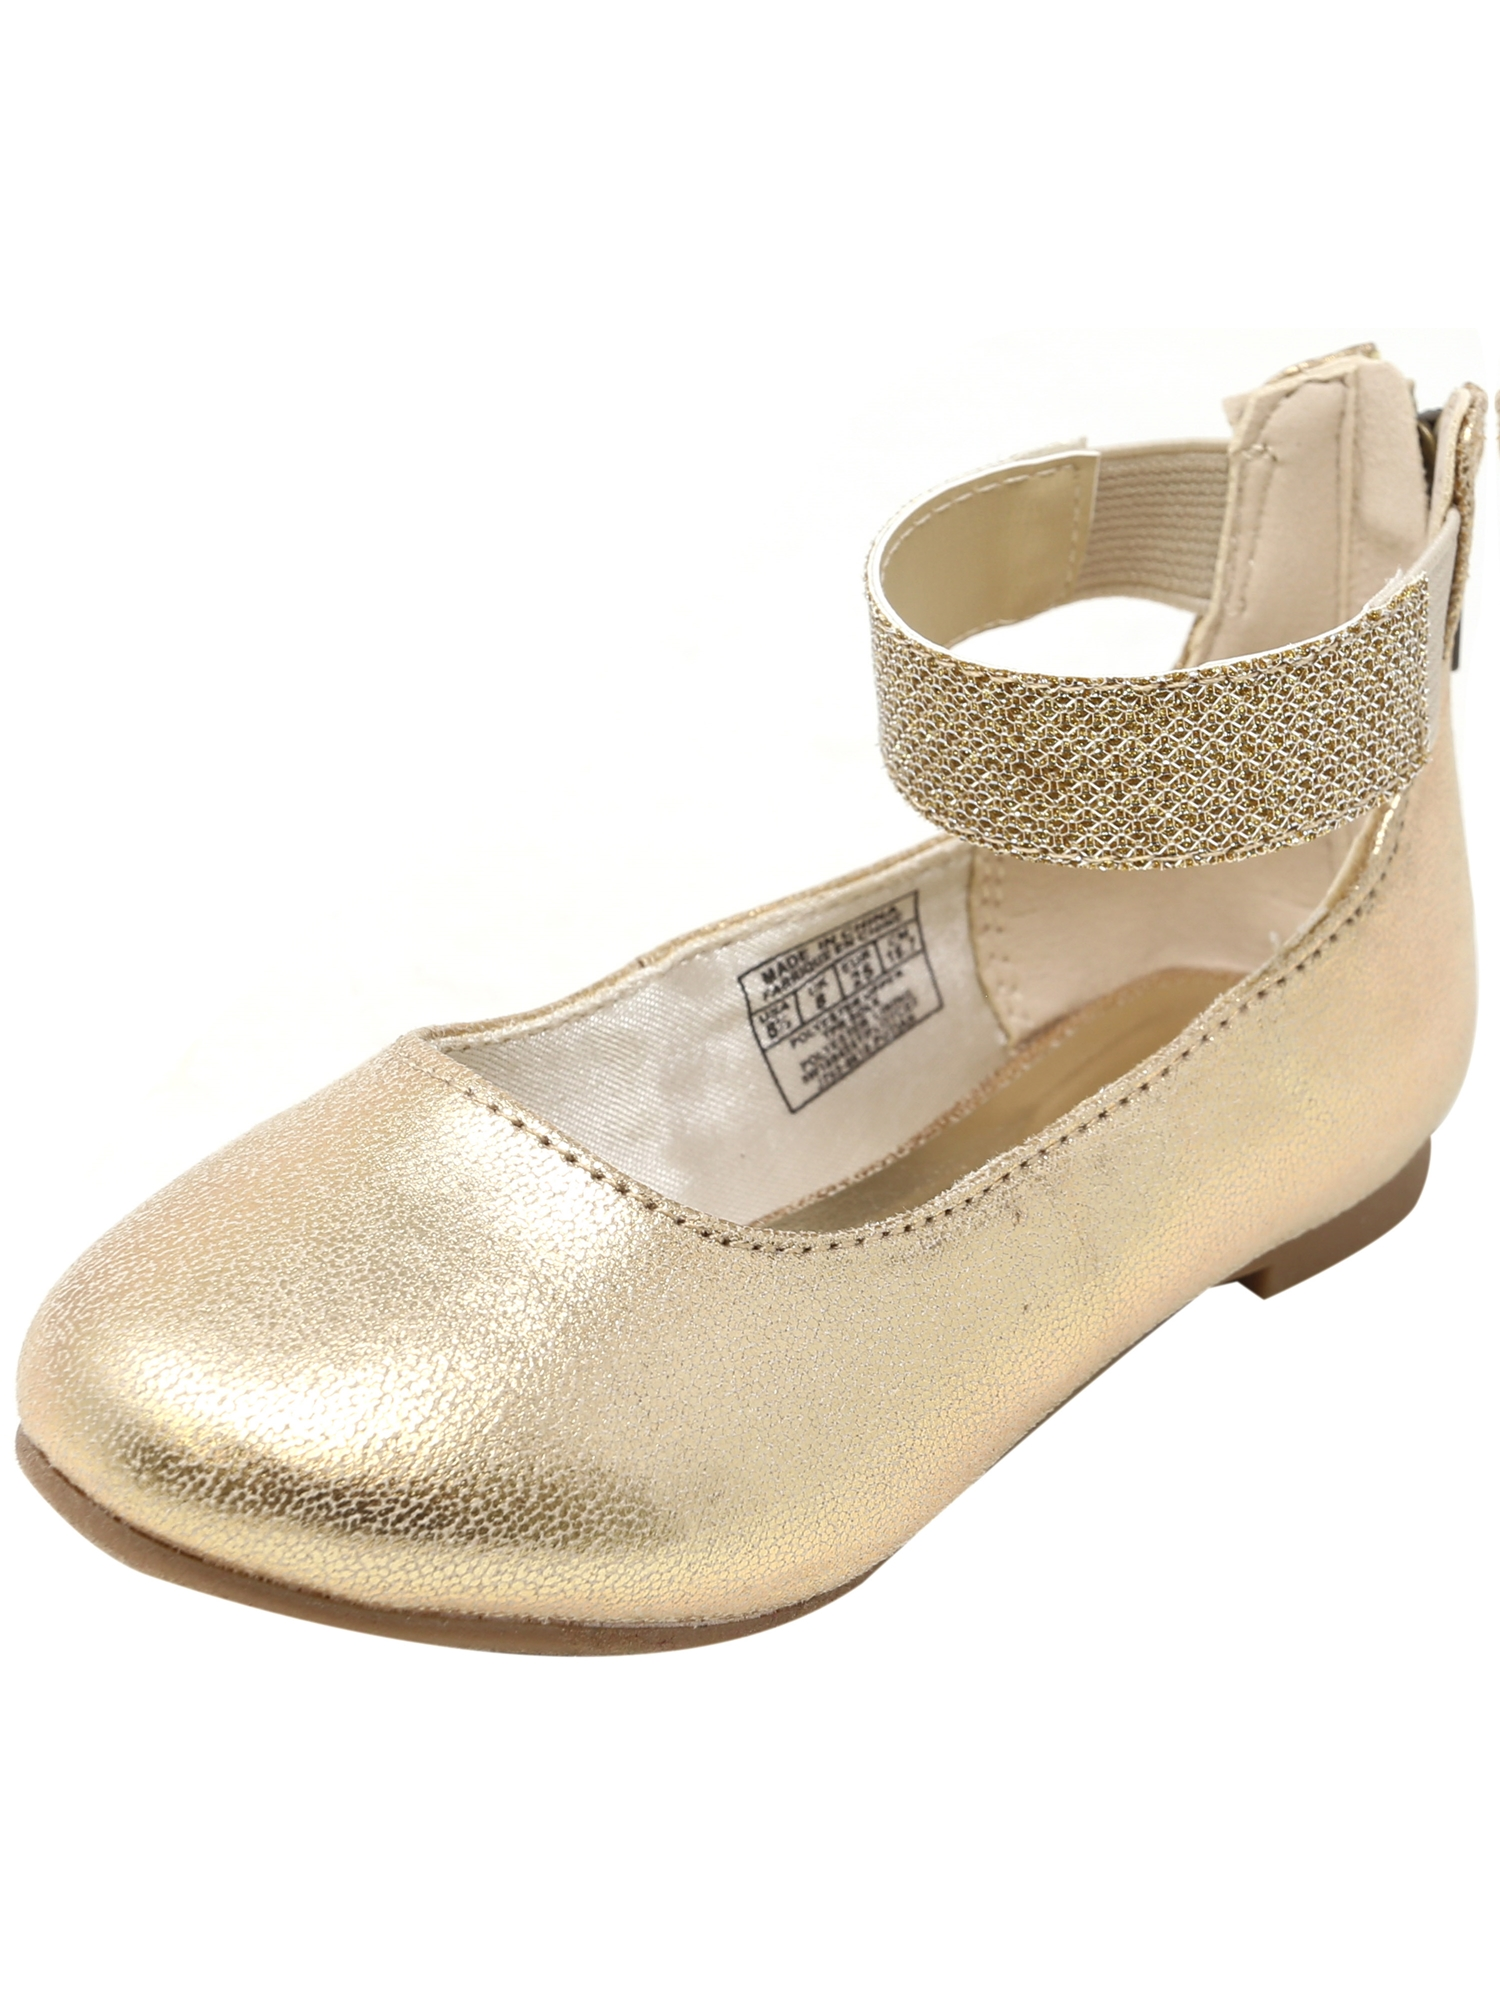 Nine West Floycee Ankle-High Flat Shoe